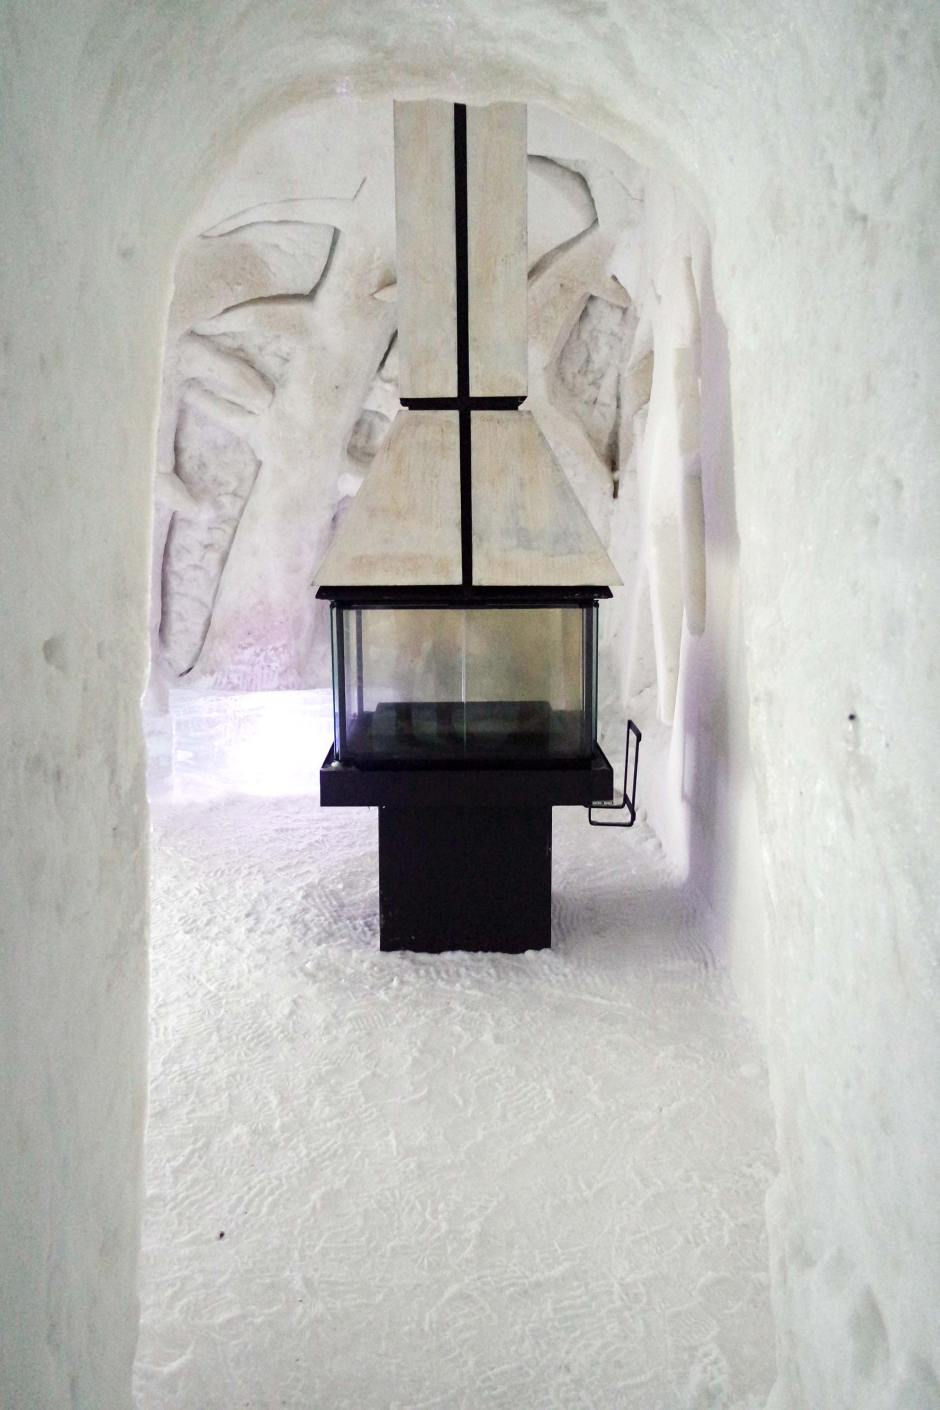 hôtel de glace québec hebergement insolite canada (2)